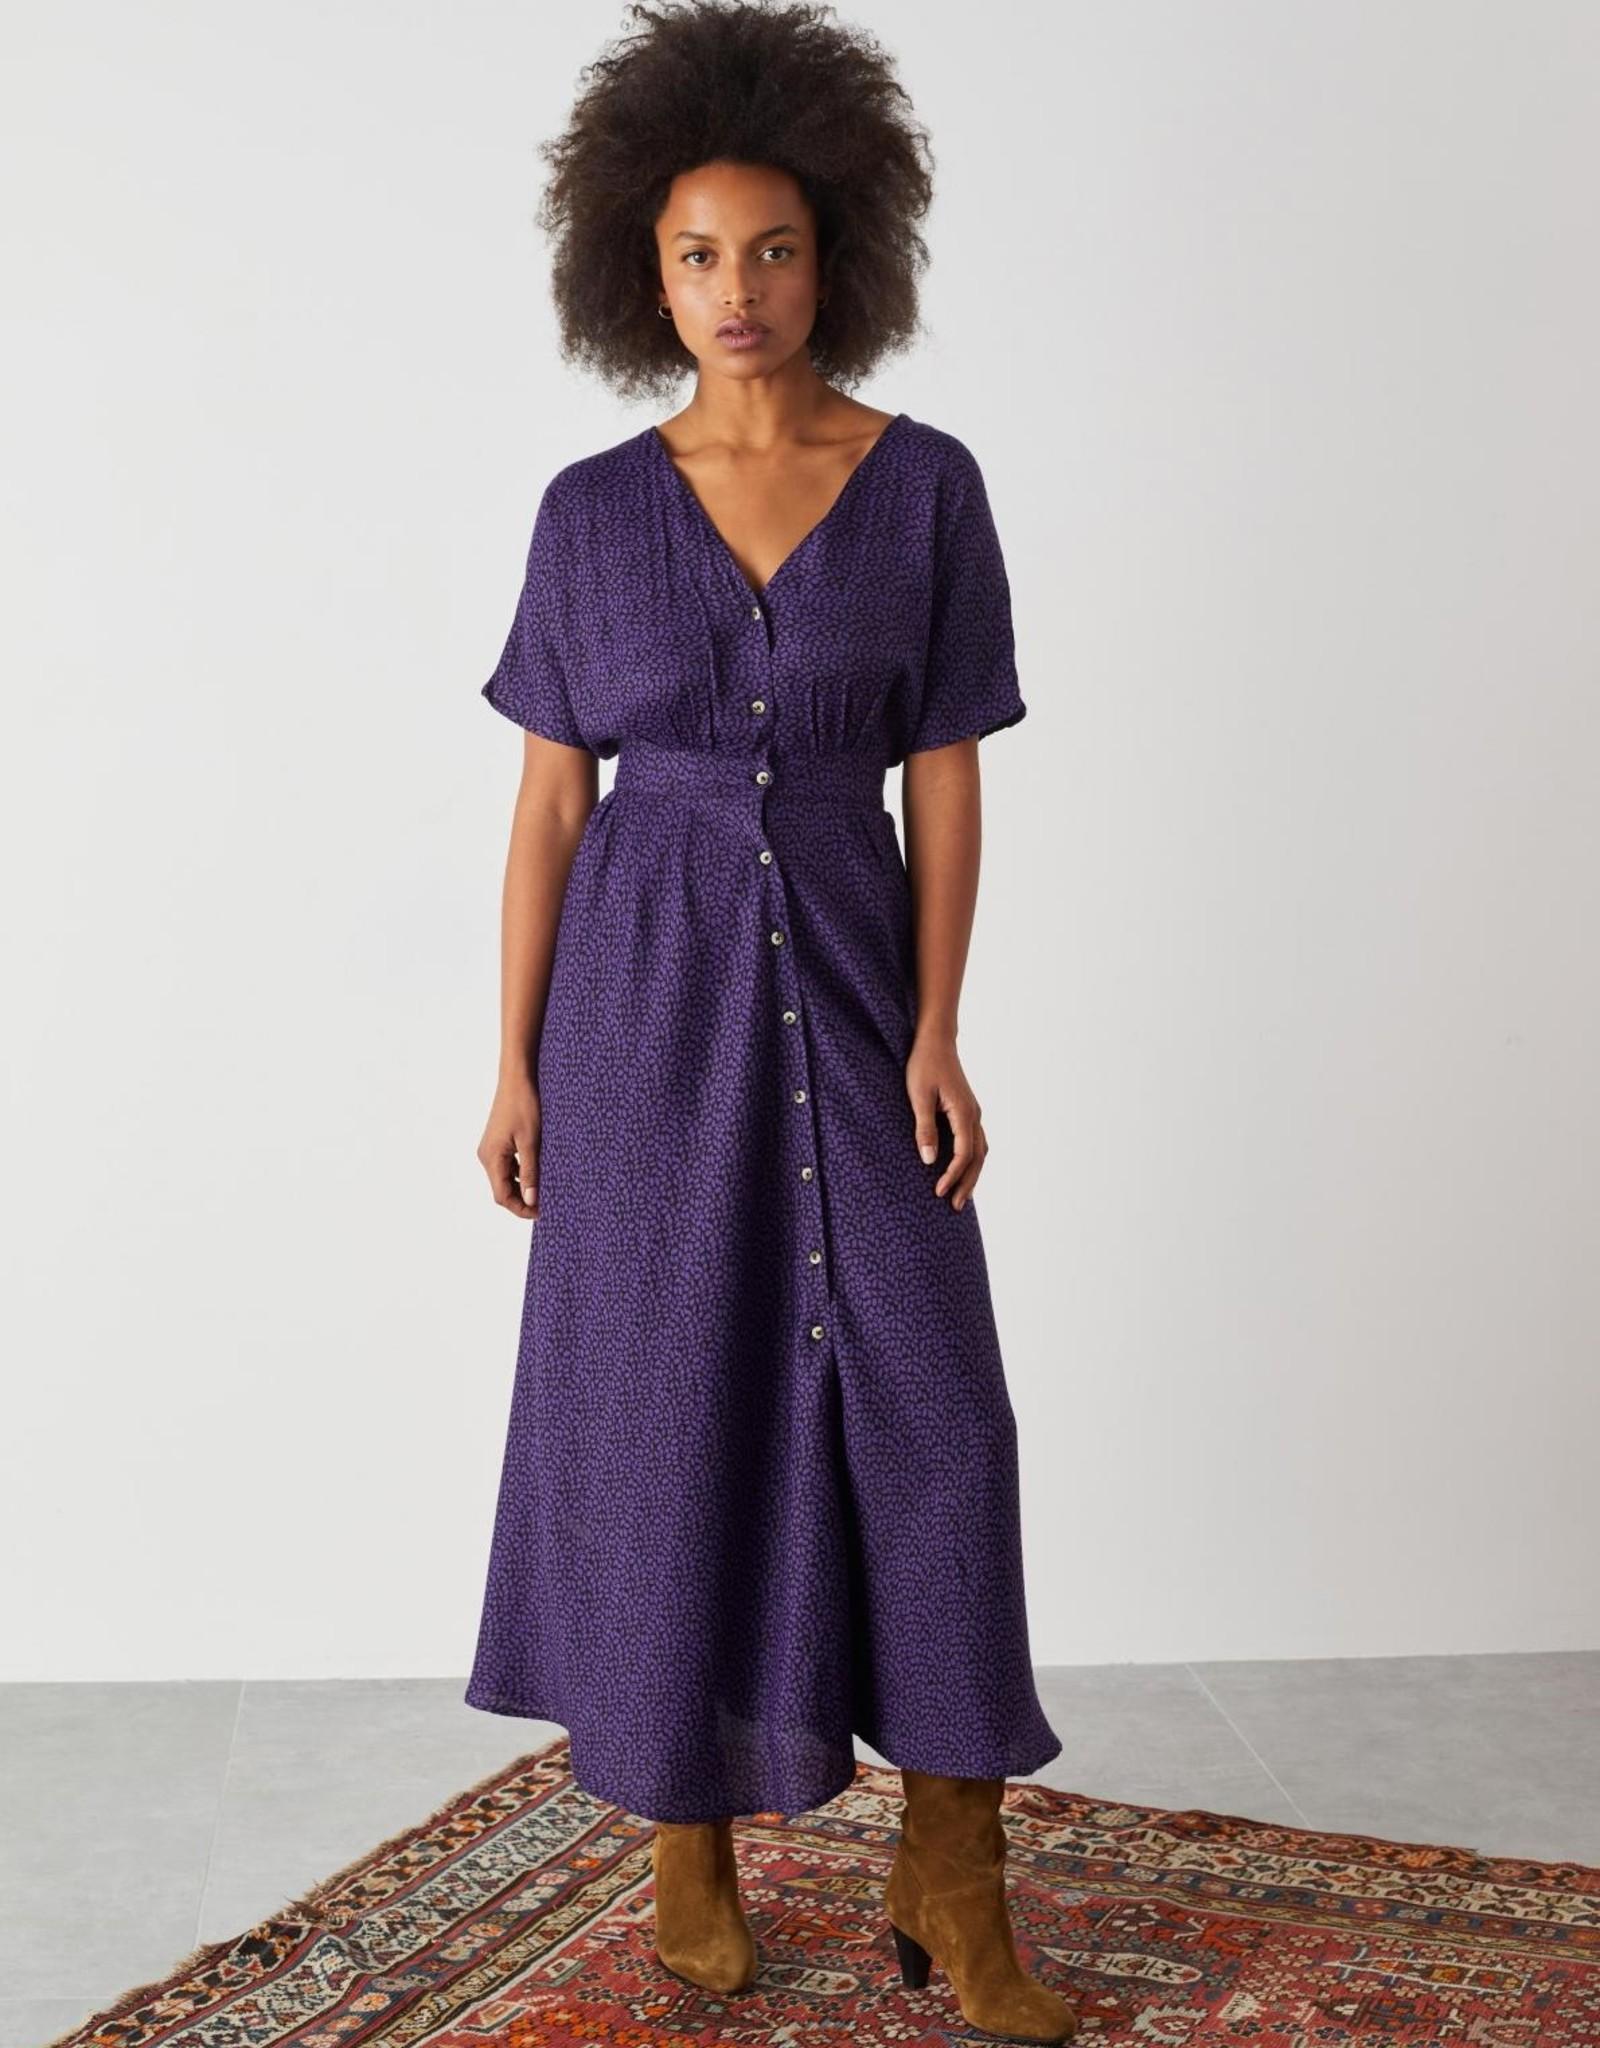 Ravel Seed Dress